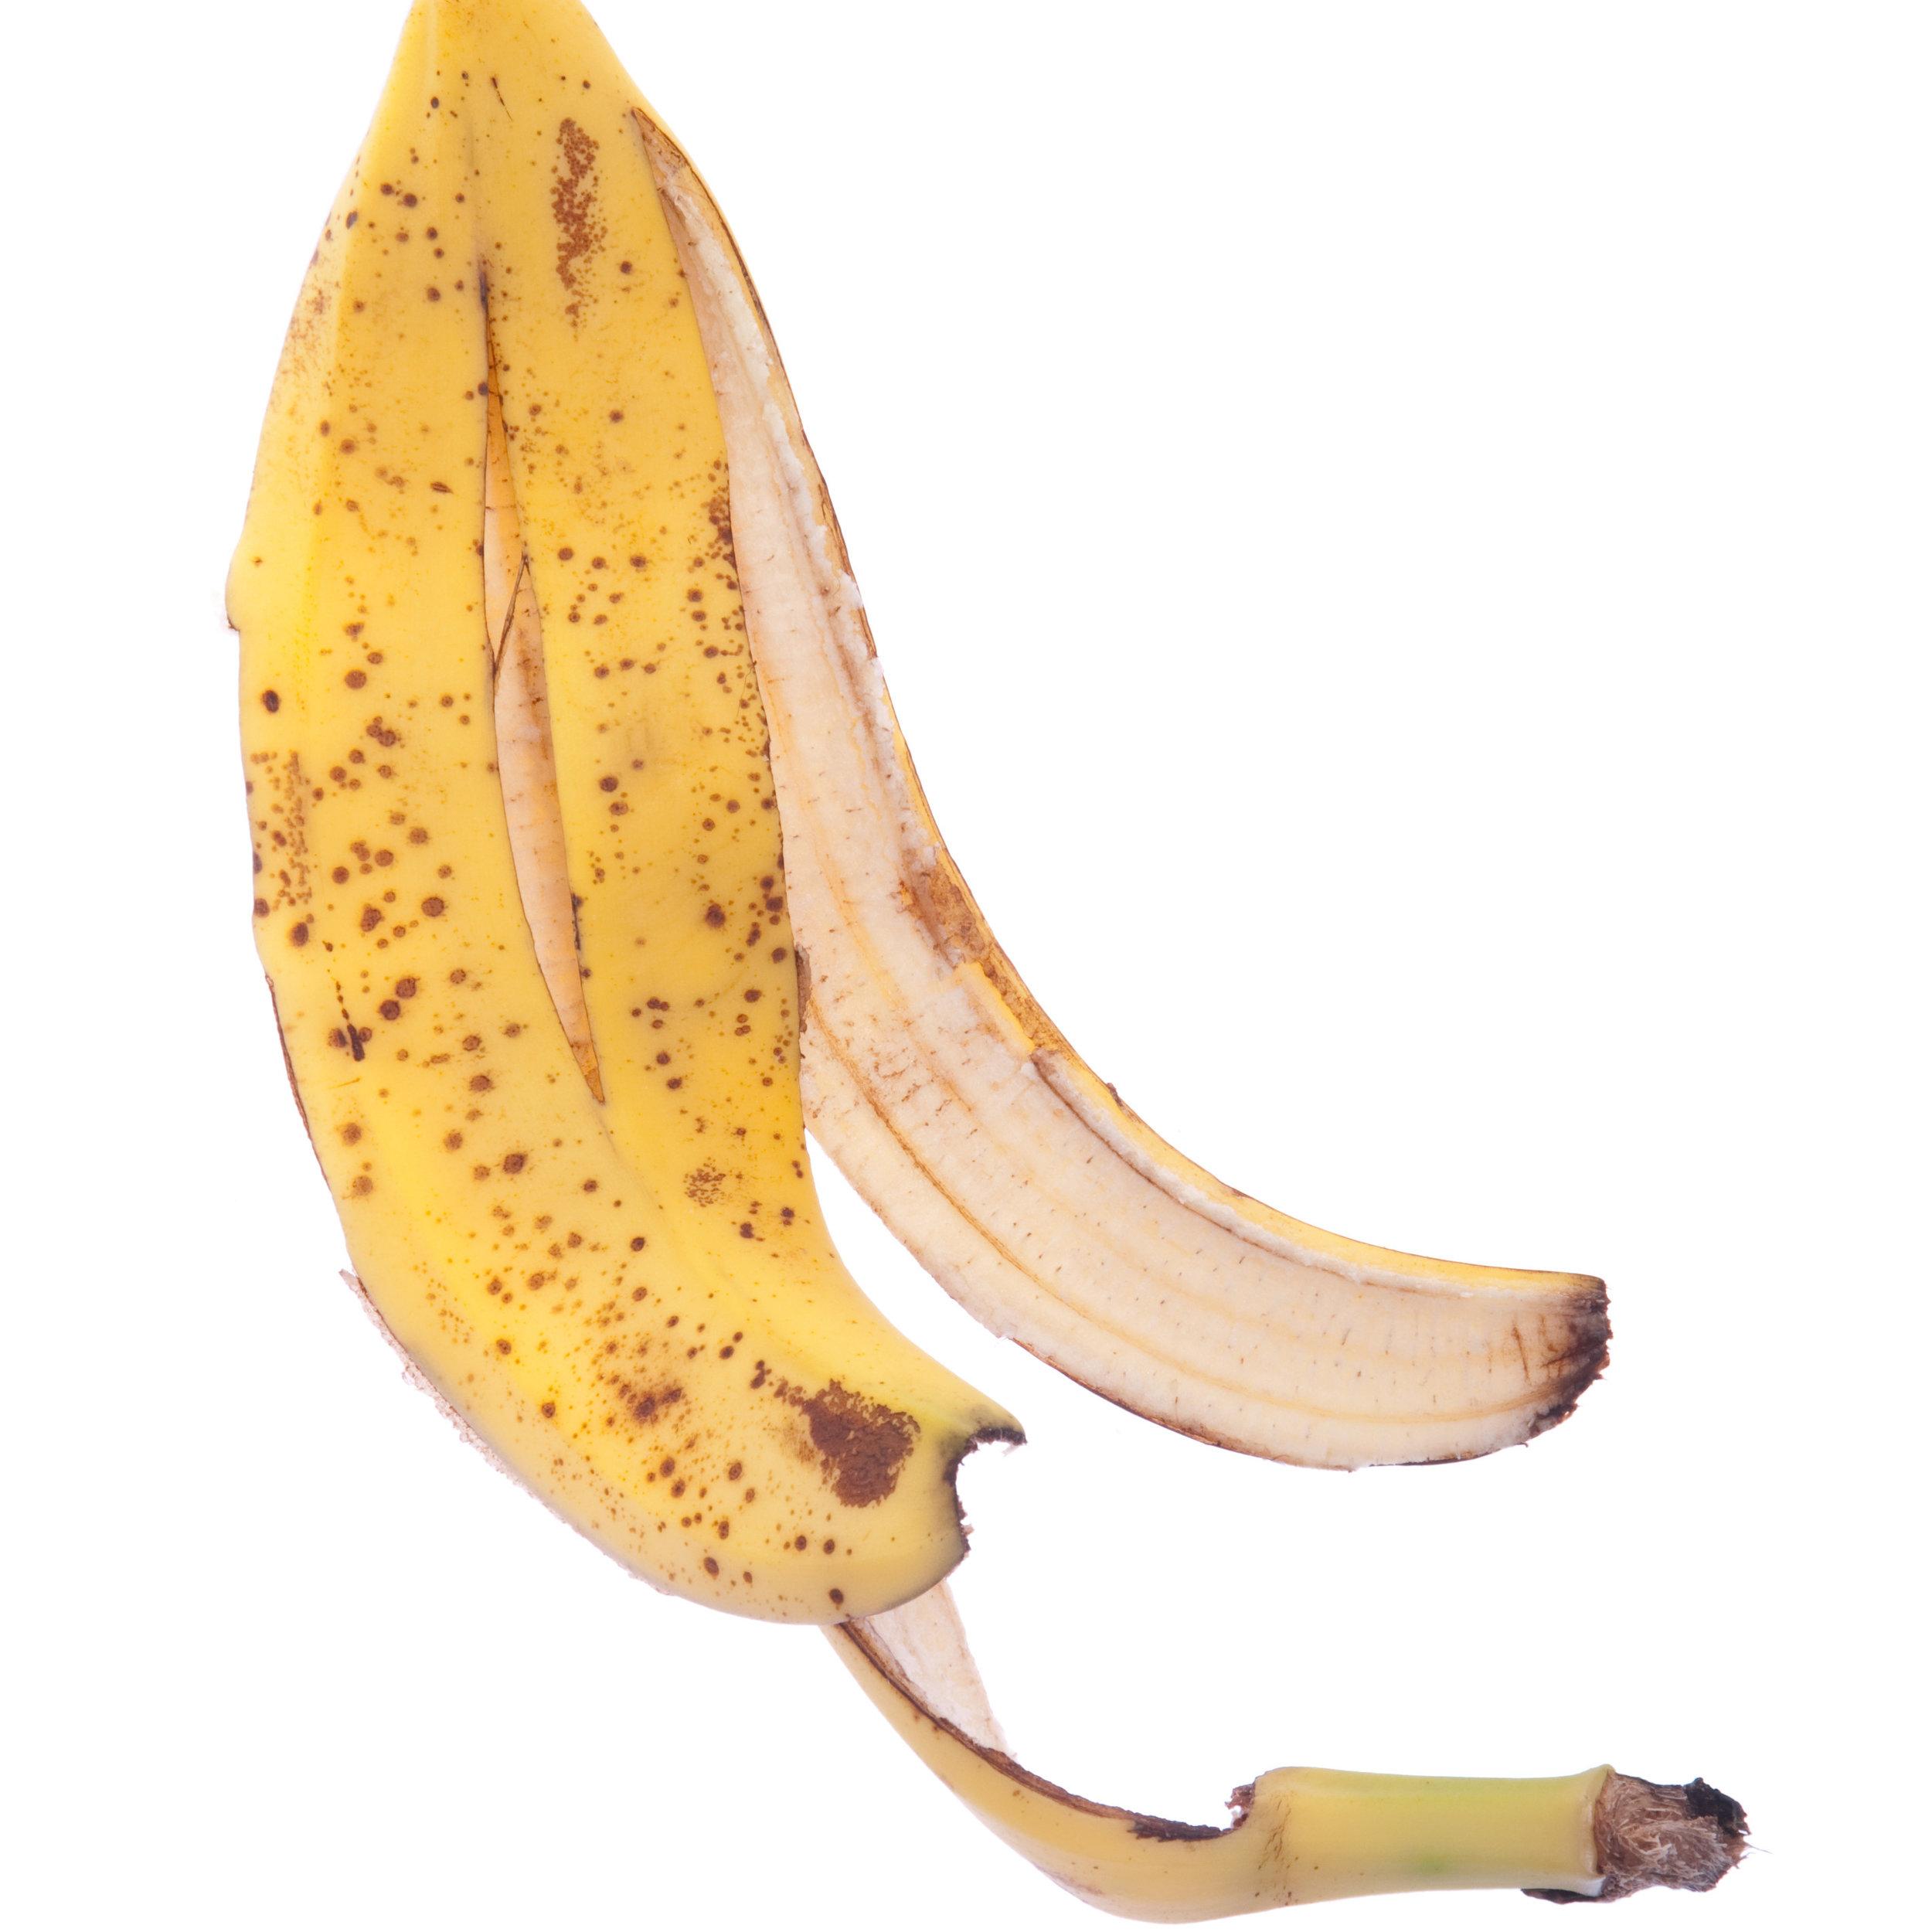 banana peel.jpg